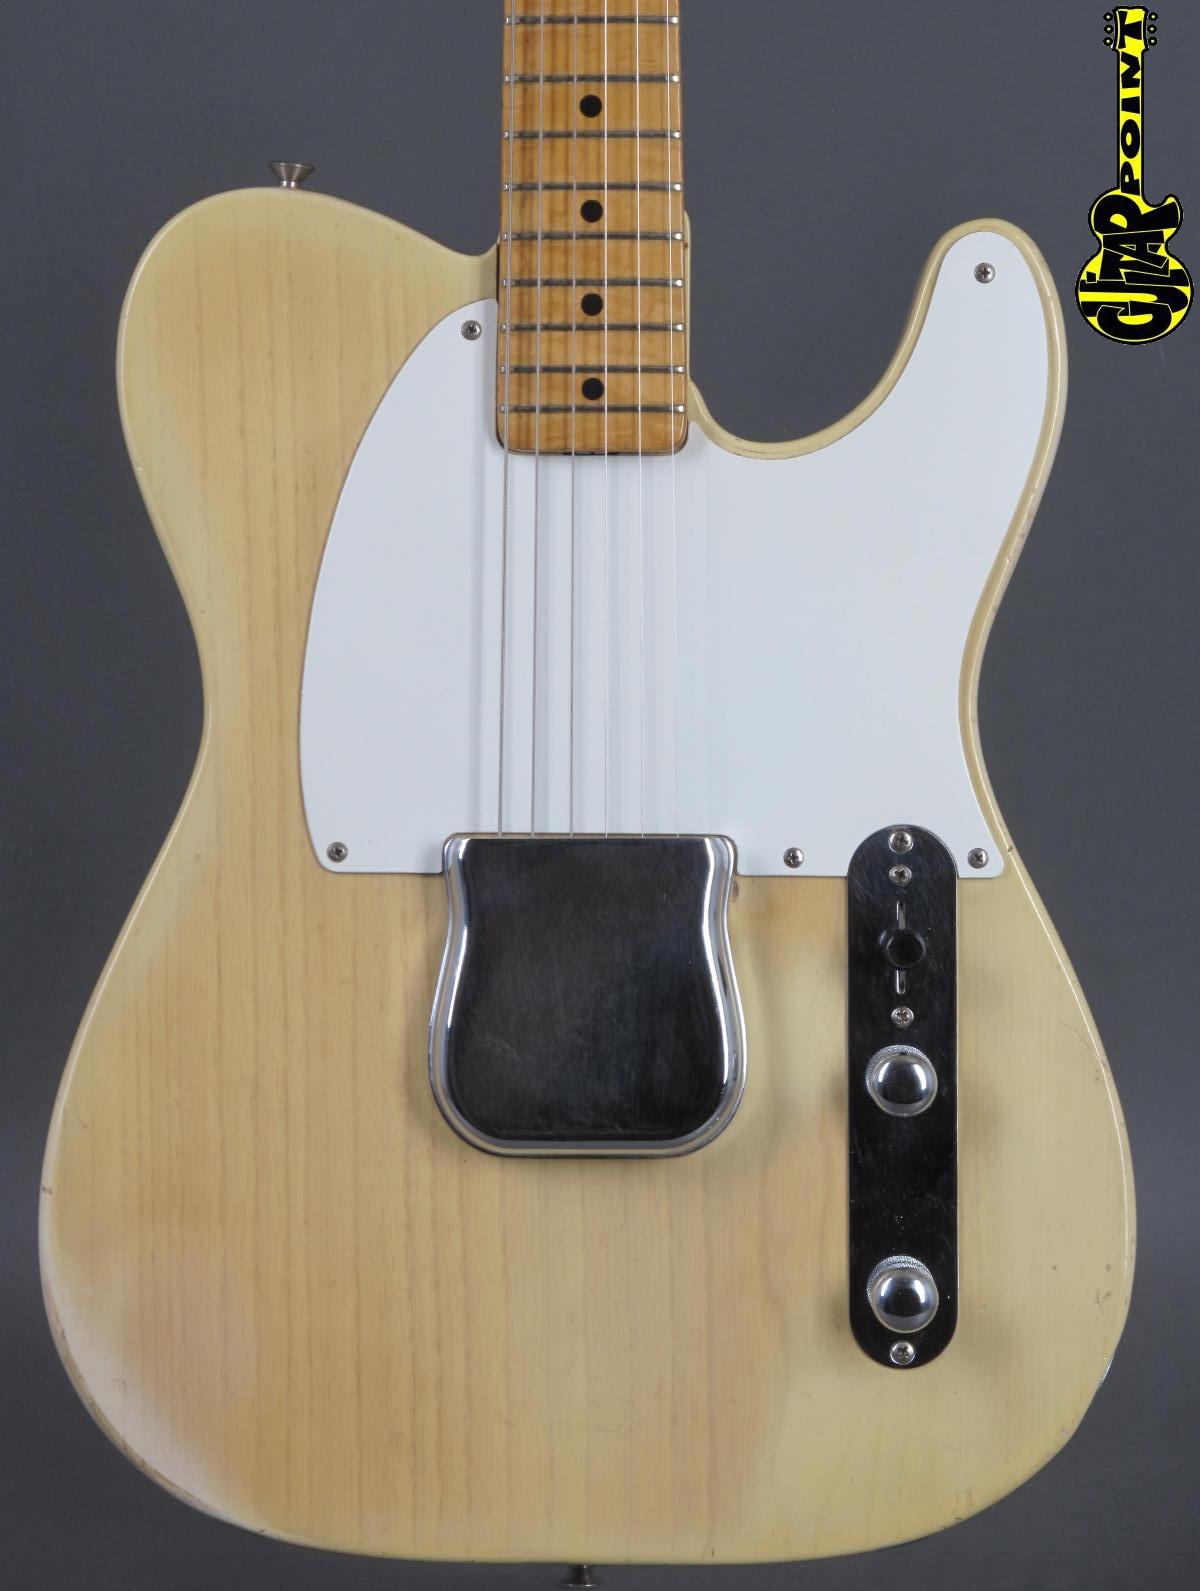 1954 Fender Esquire (Telecaster) - Blond